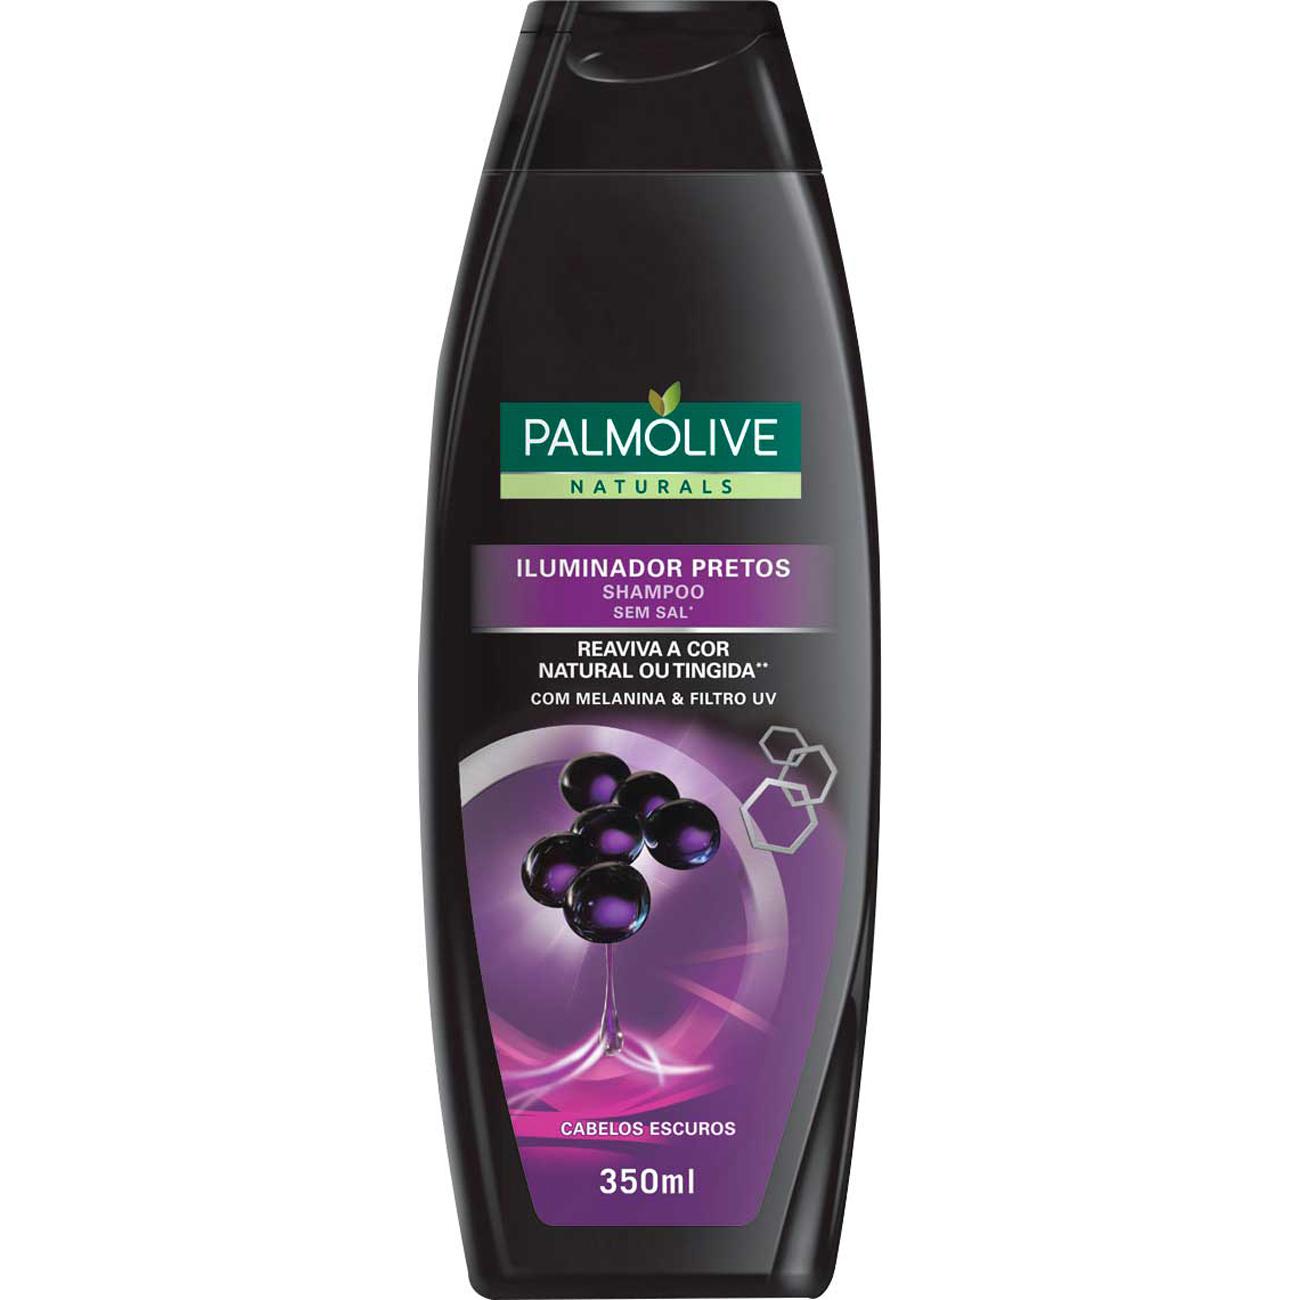 Shampoo Palmolive Naturals Iluminador Pretos 350Ml